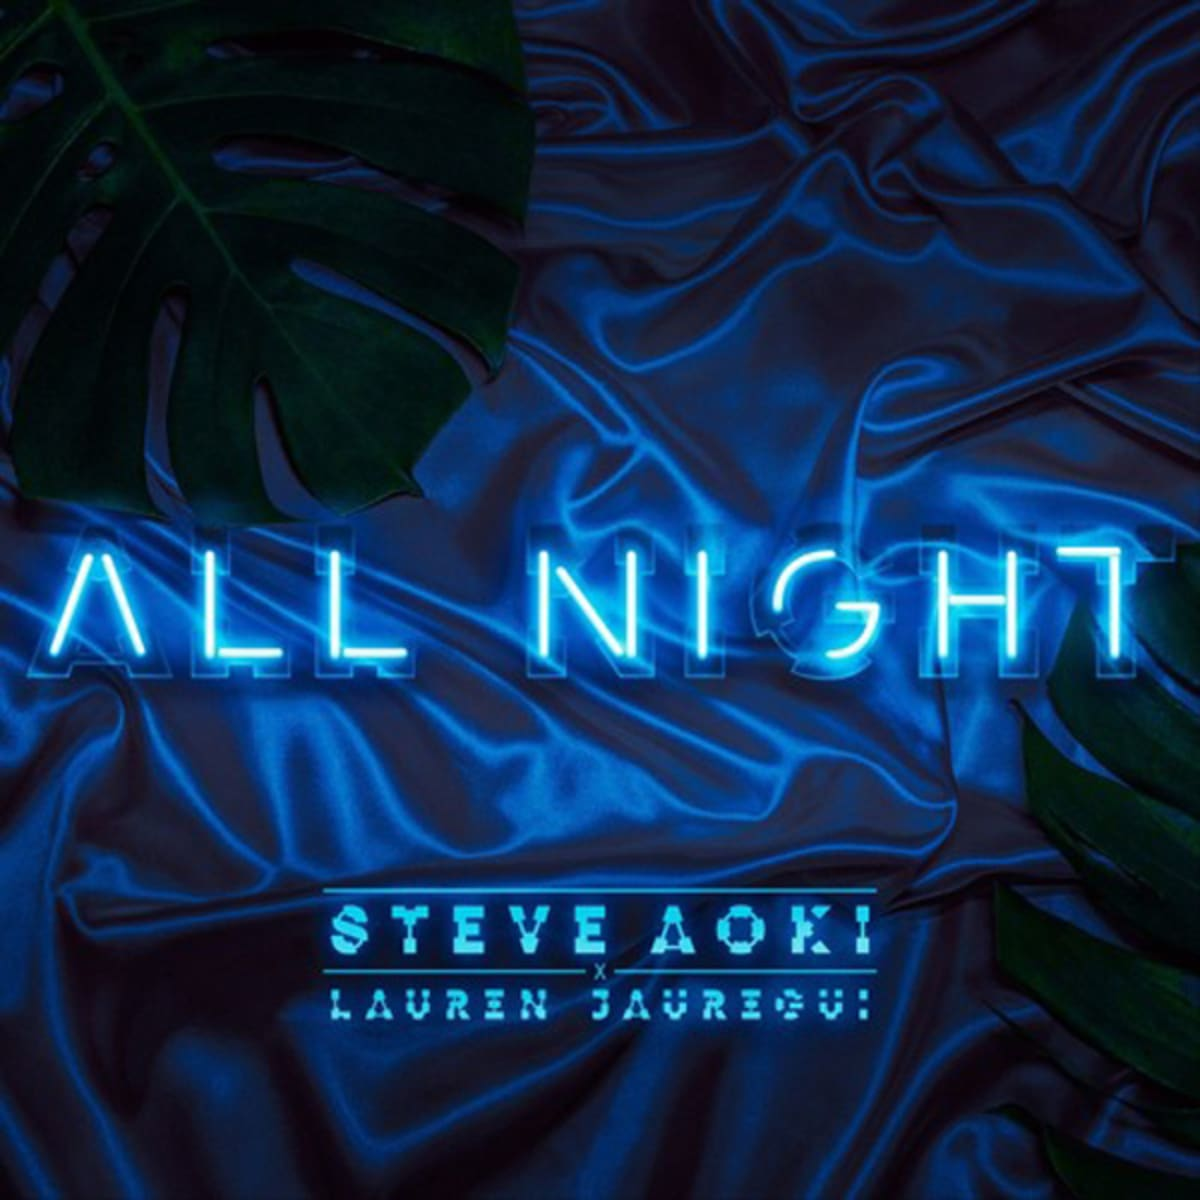 Steve Aoki And Lauren Jauregui Bring The Magic With New